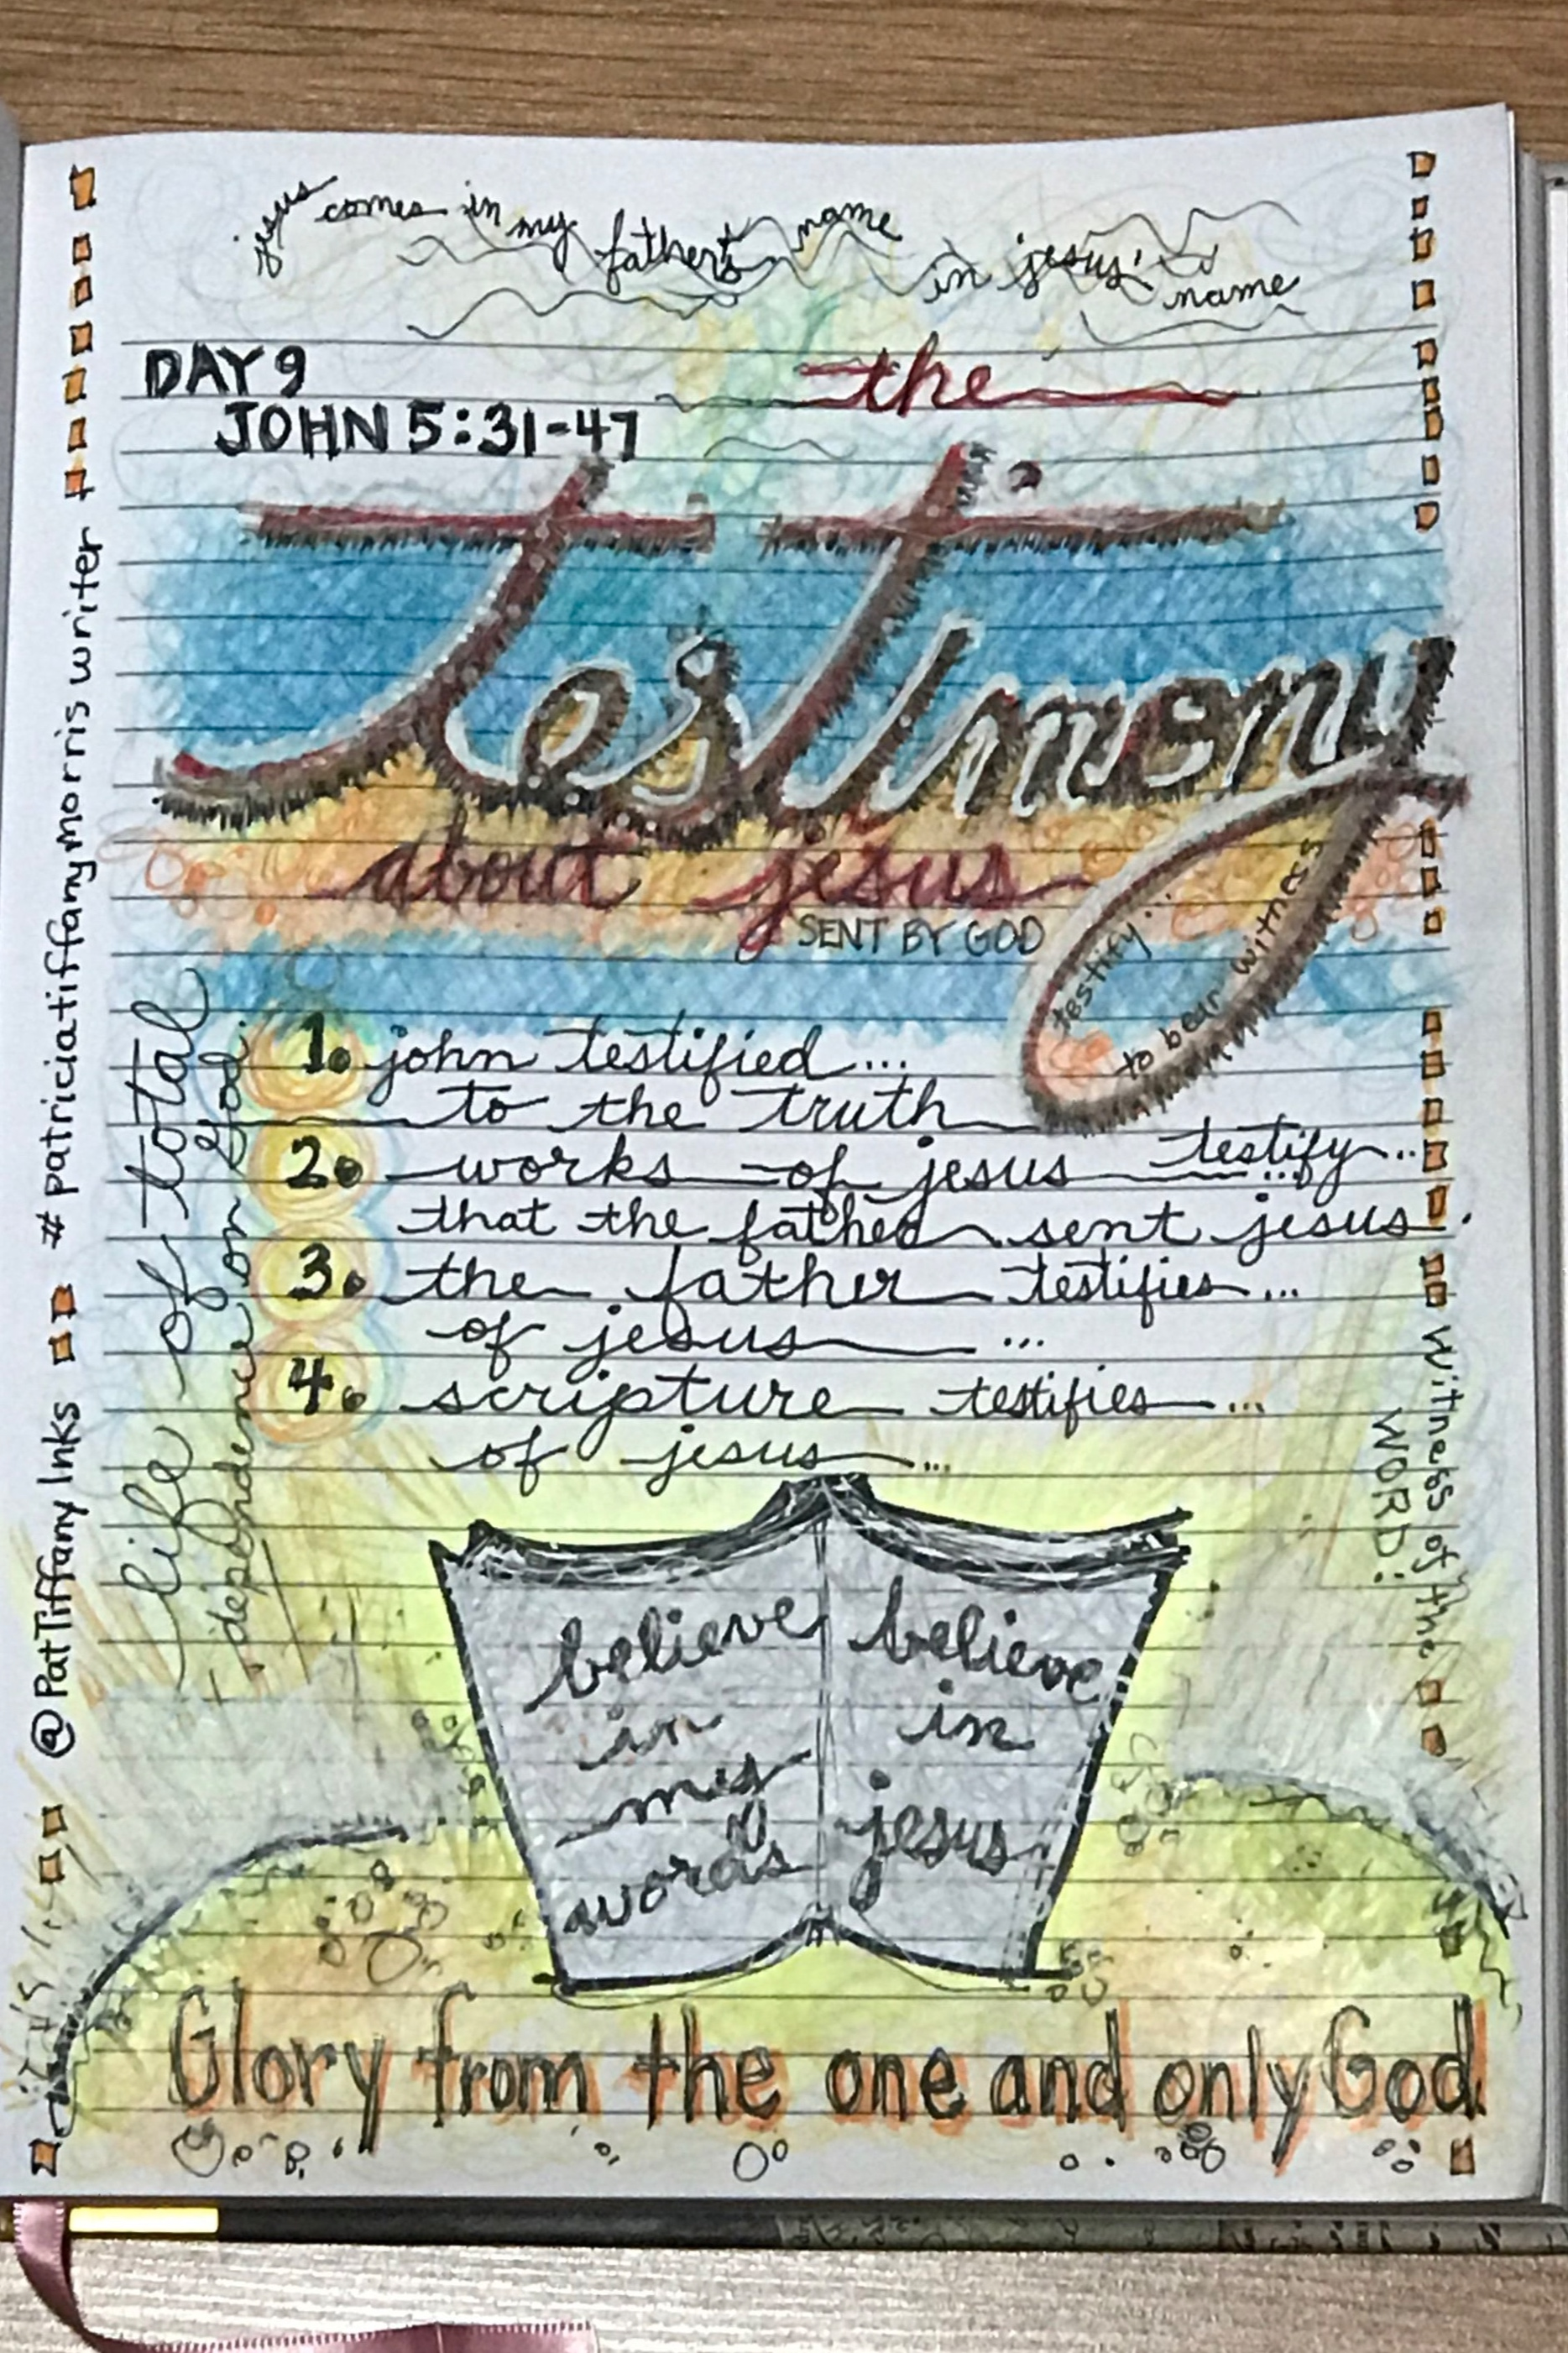 Gospel+of+John+CH+5+31-47+Day+9+Scripture+Patricia+Tiffany+Morris.jpg